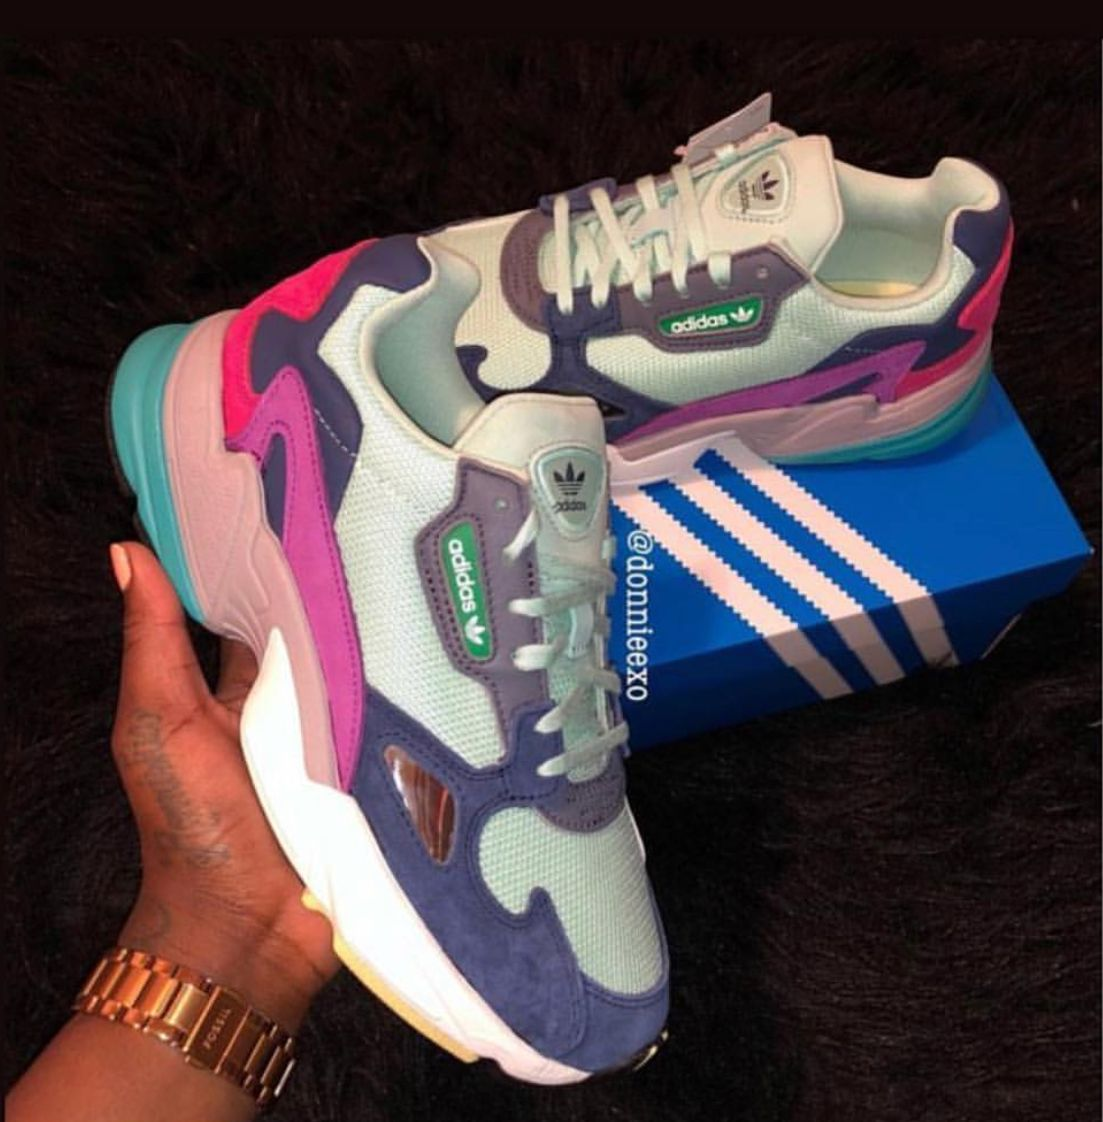 AliyaMadani | shoes em 2019 | Shoes, Sneakers e Dad sneakers